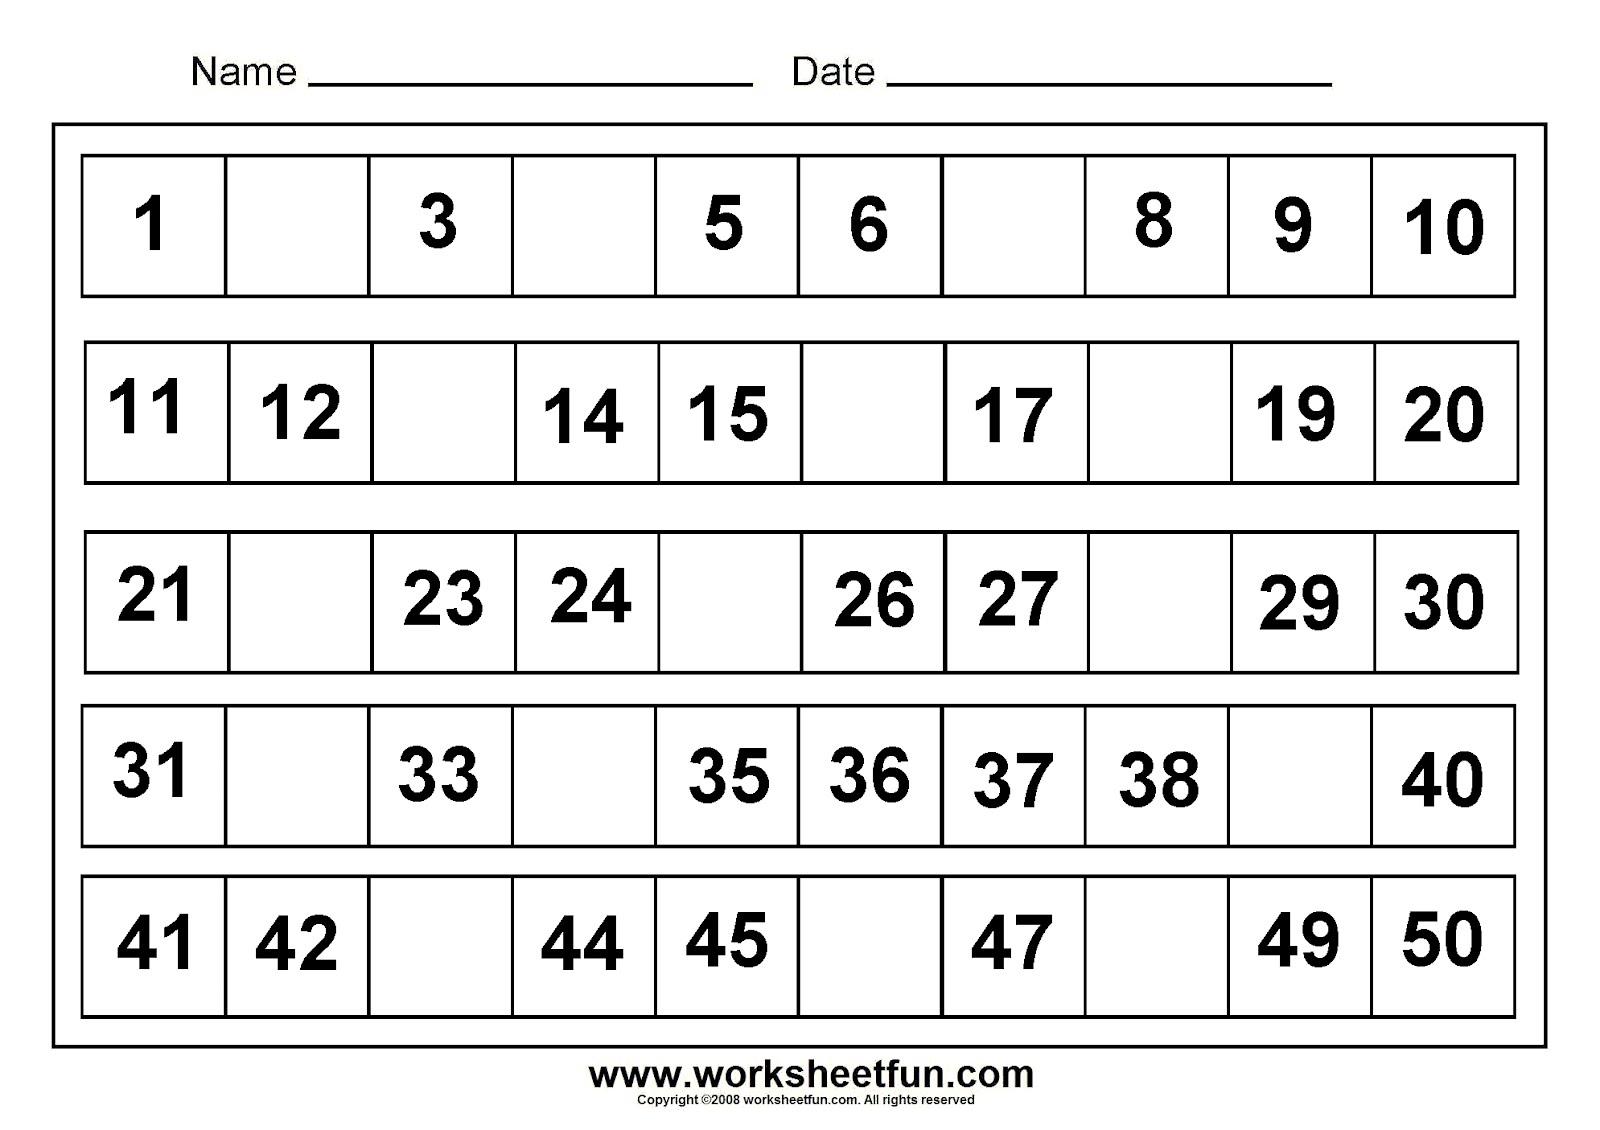 Easily Worksheets For Kids To Print Kindergarten All Download  23023